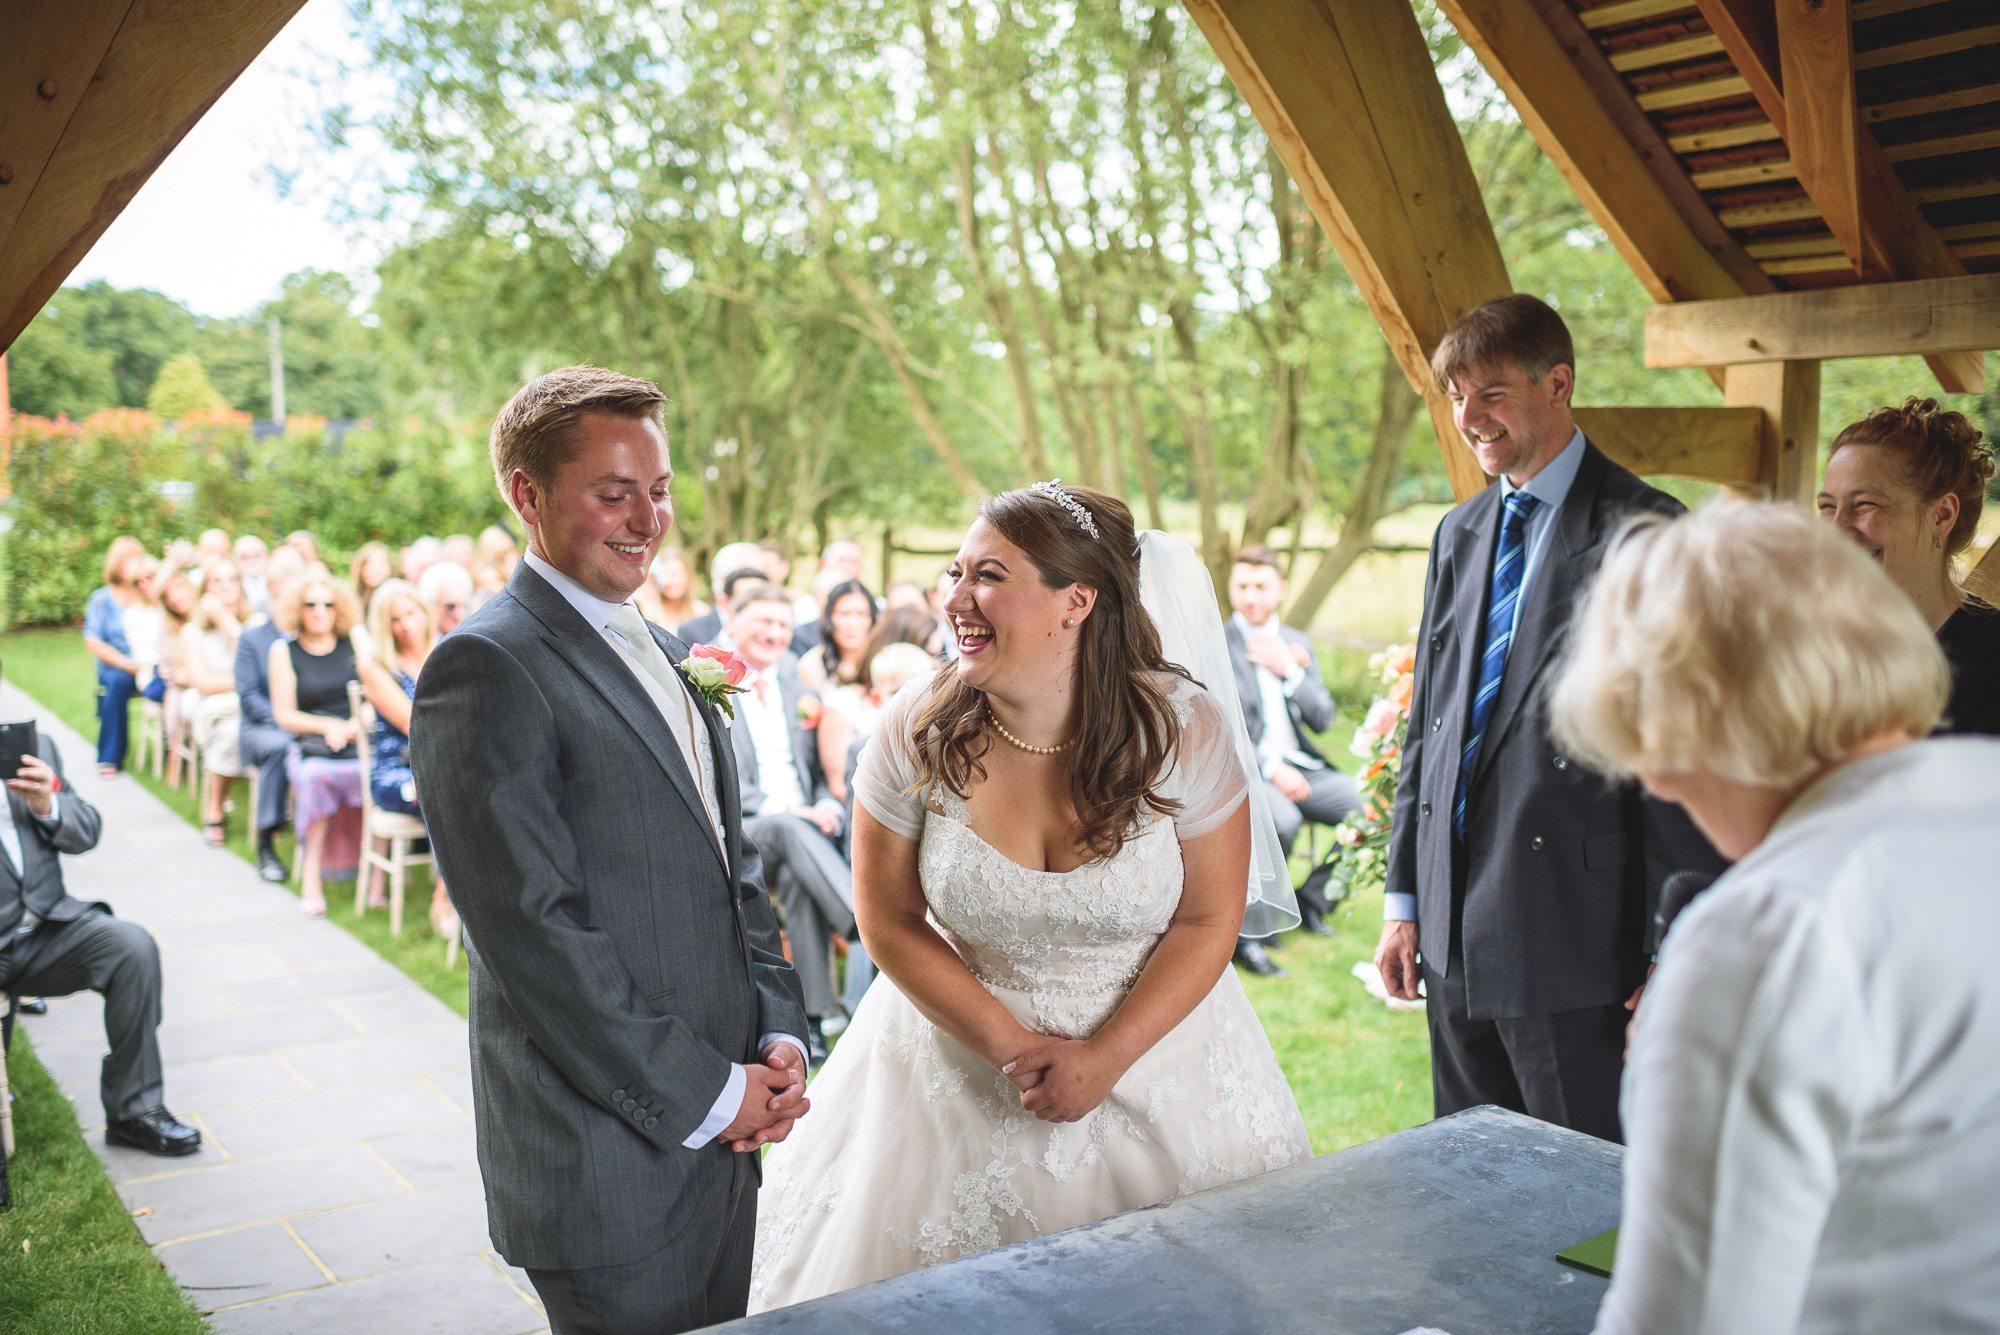 Lauren-and-Lee-Millbridge-Court-wedding-photography-68-of-166